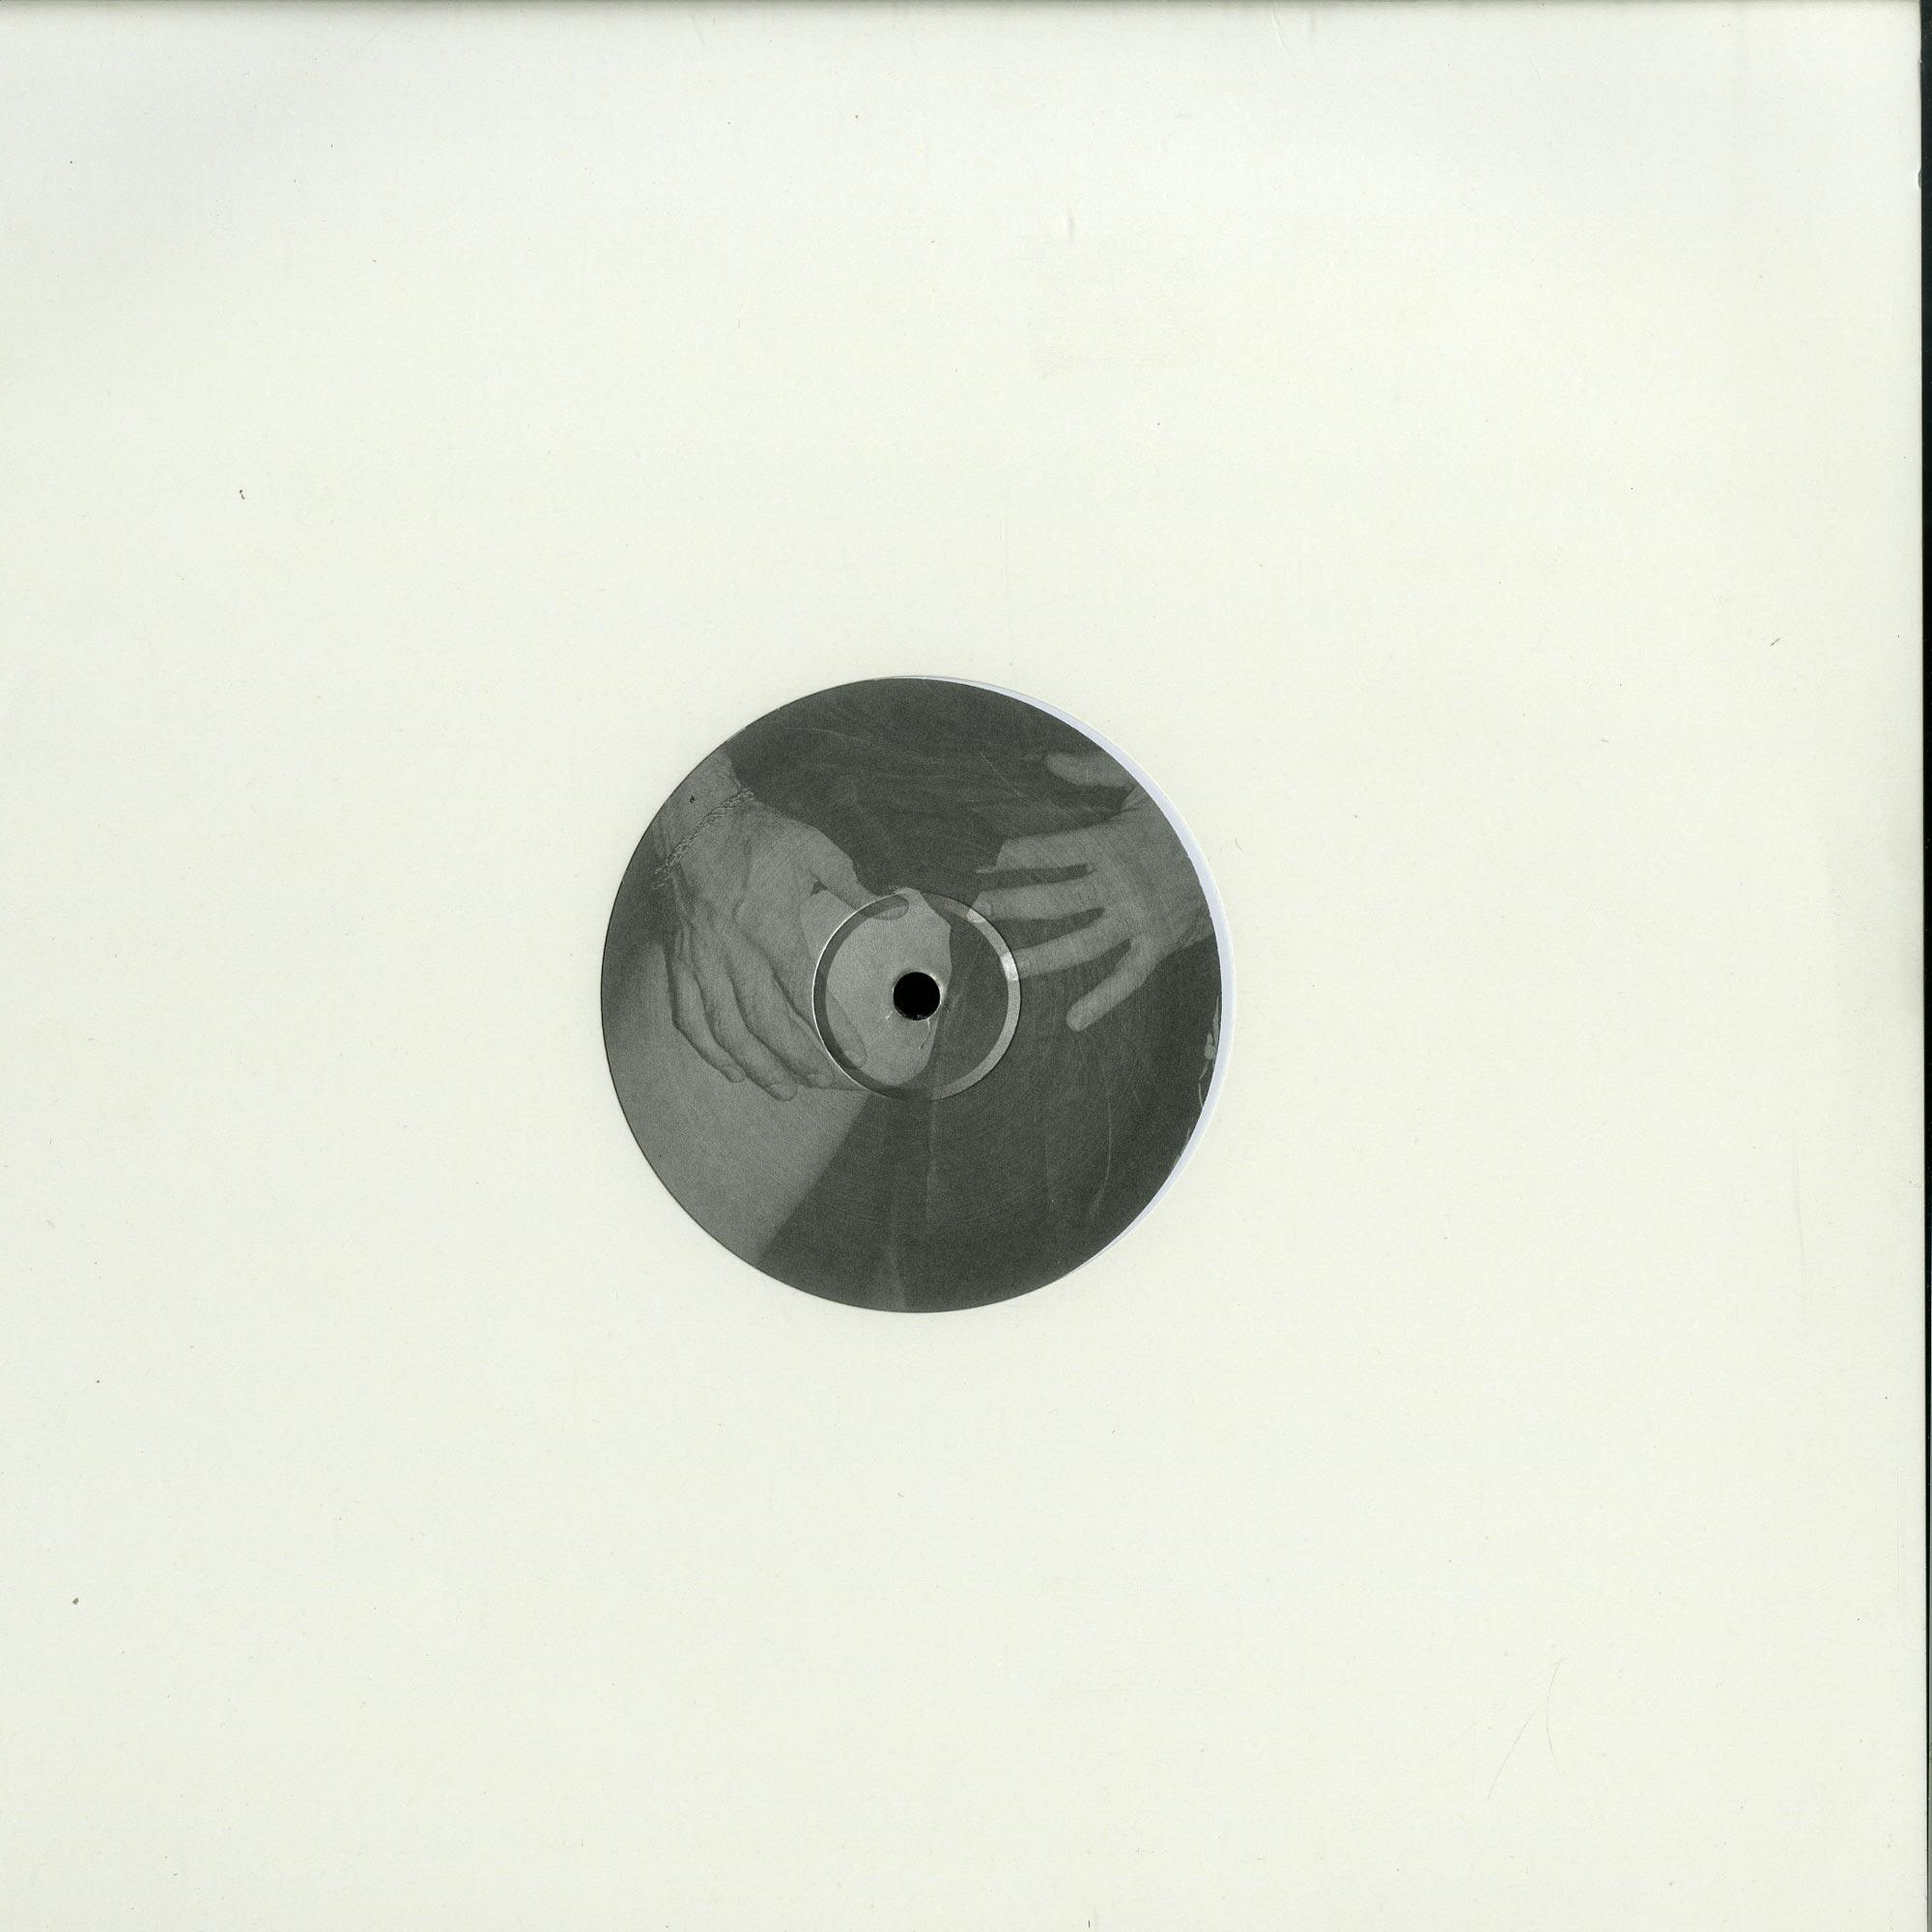 Playgroup - PREVIOUSLY UNRELEASED BONUS EP